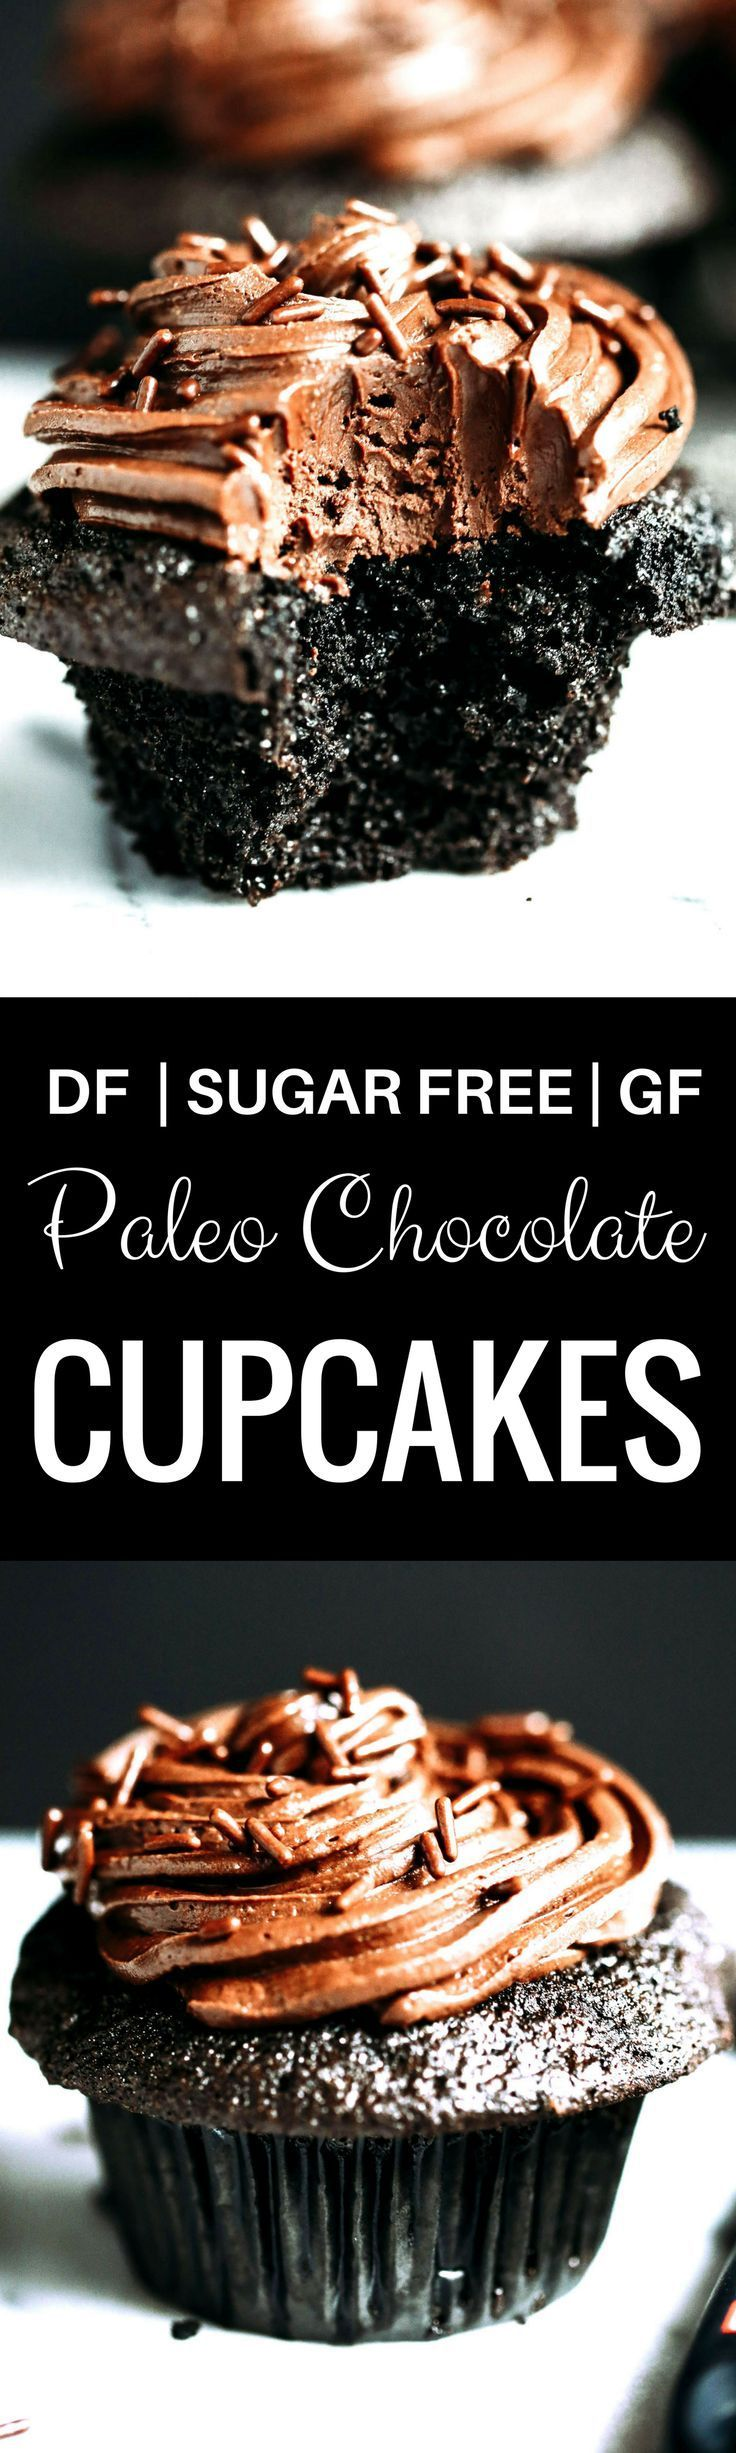 Paleo Chocolate Cupcakes (gluten-free, dairy-free, sugar-free)